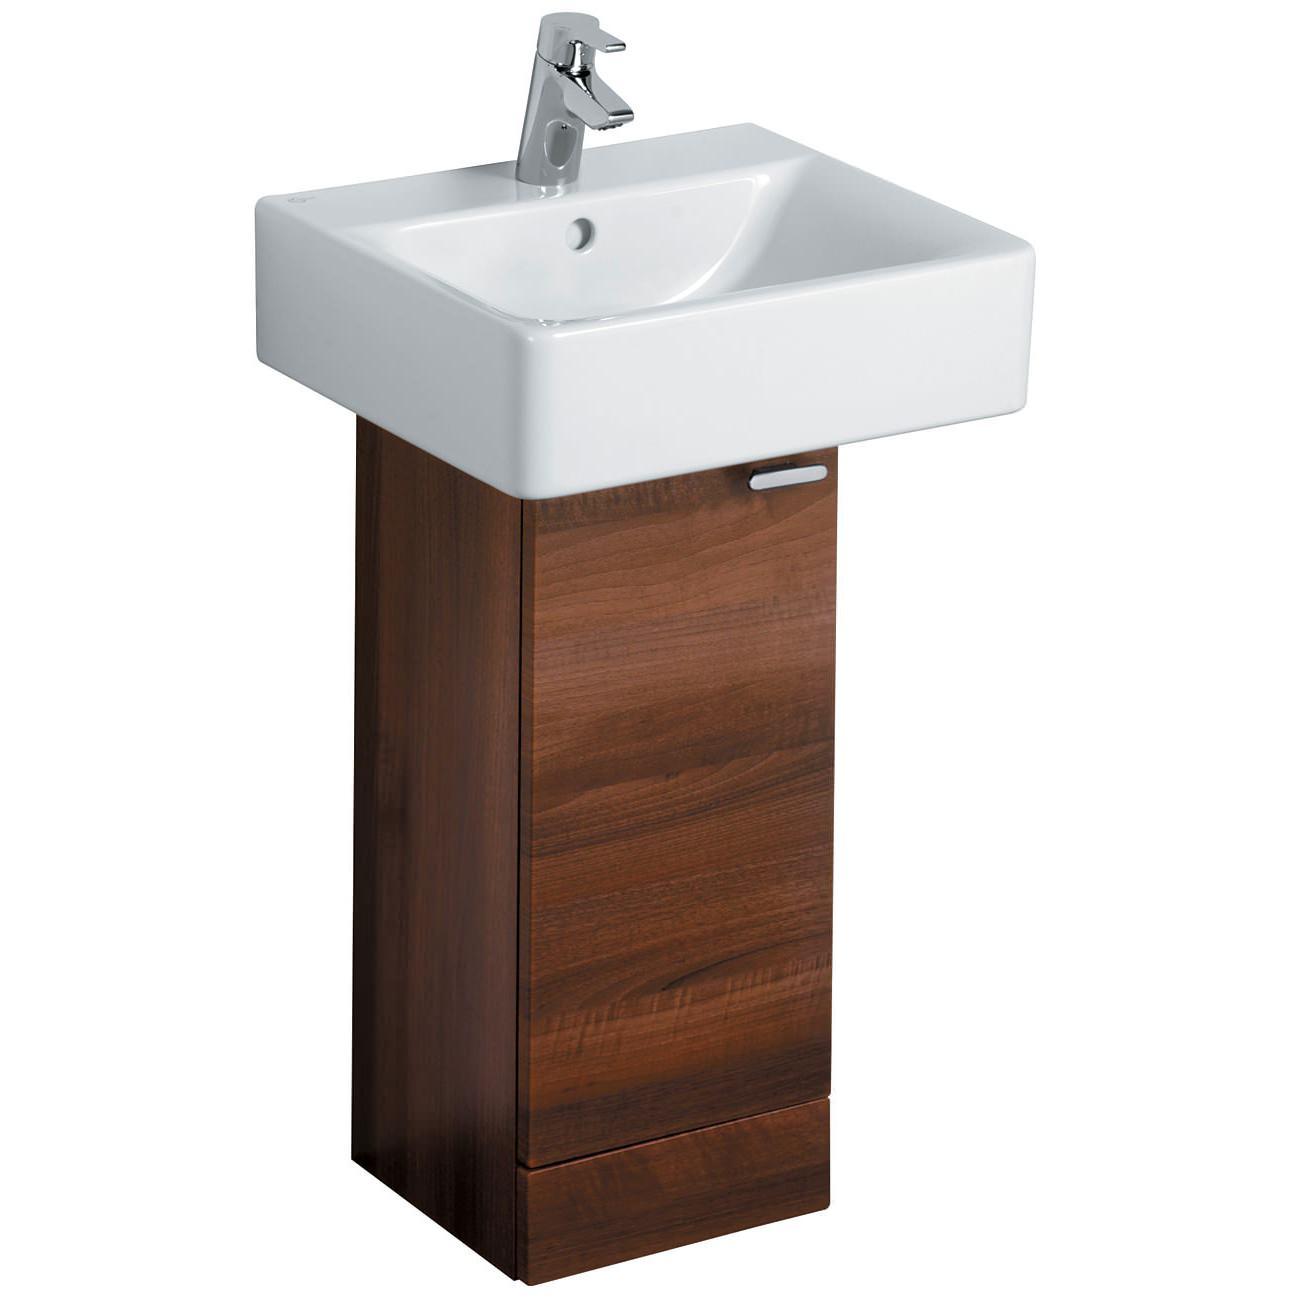 Pedestal Vanity Unit : ... small vanity units ideal standard concept basin pedestal unit 300mm